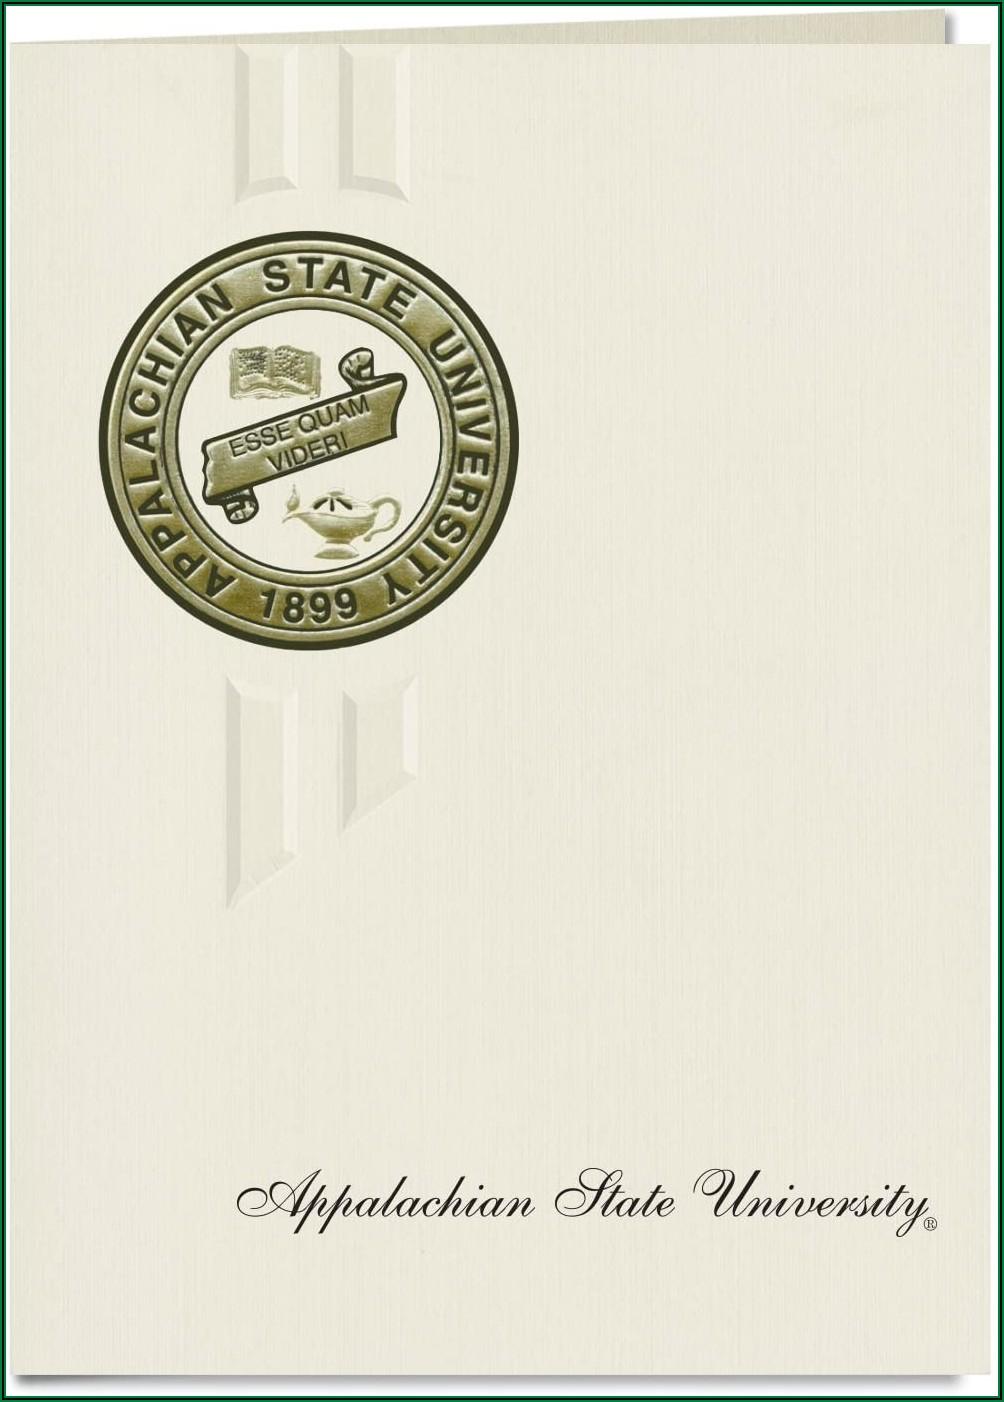 Appalachian State Graduation Announcements